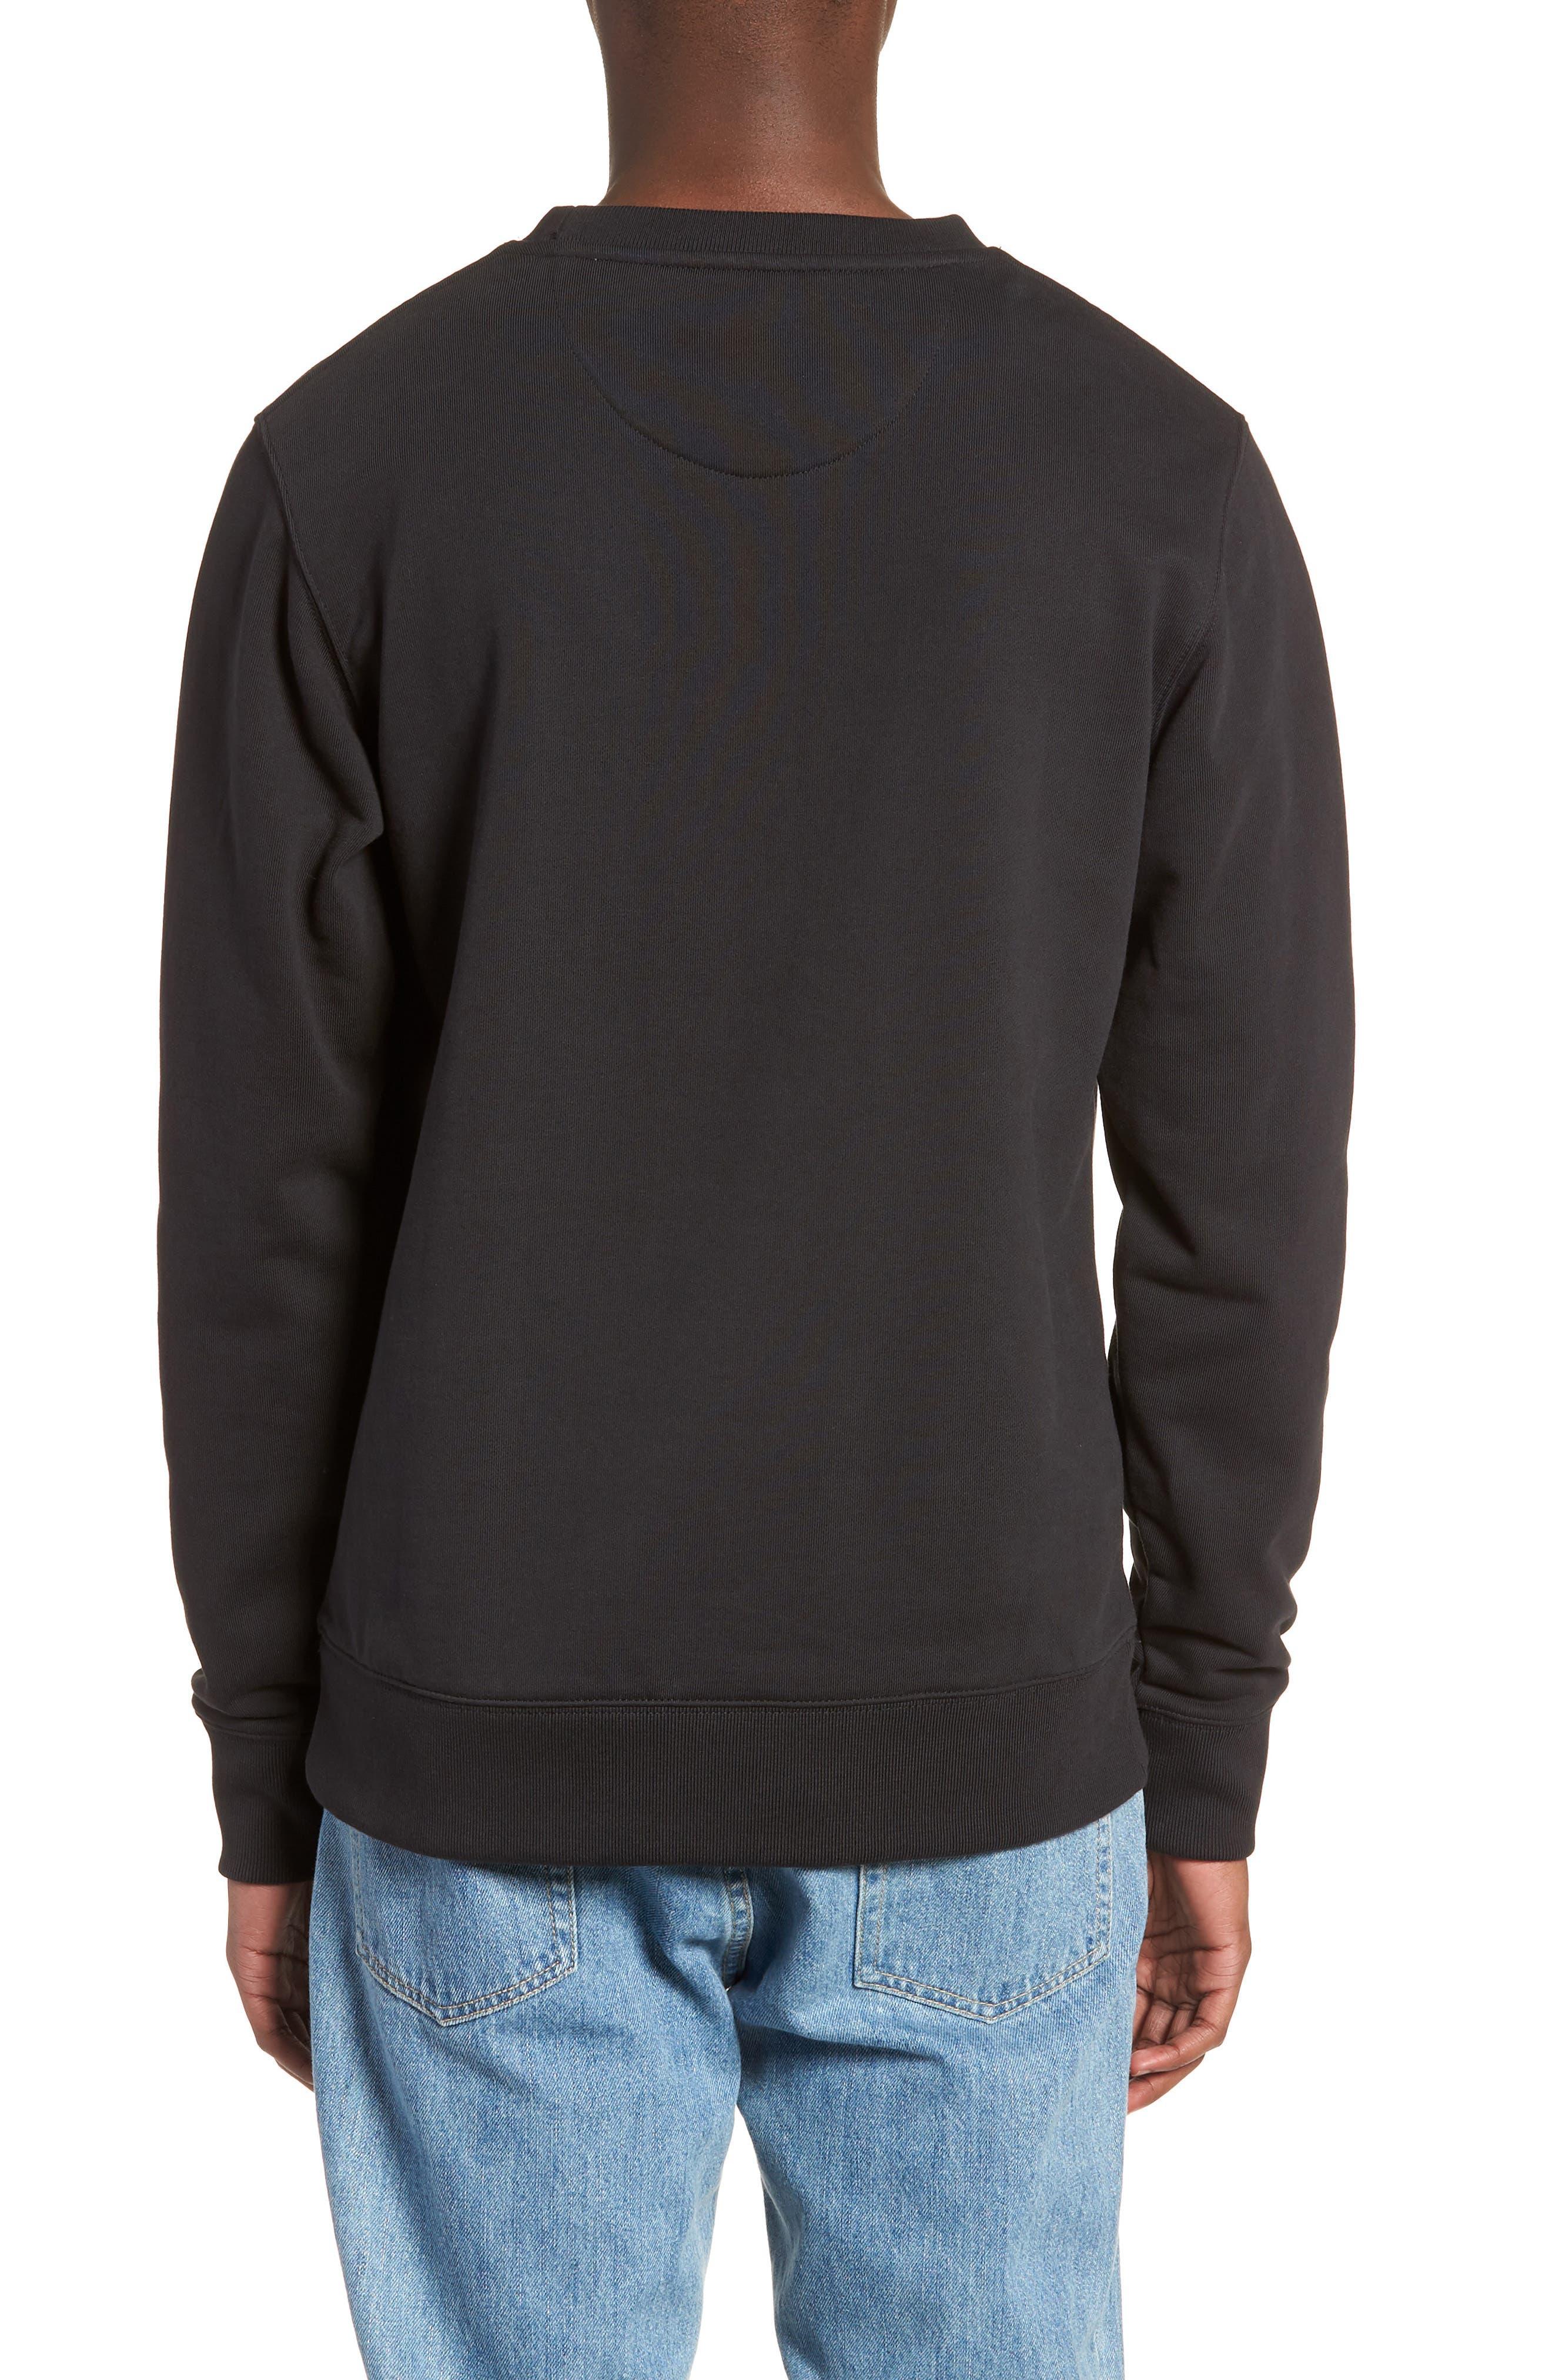 Bowery Slash Sweatshirt,                             Alternate thumbnail 2, color,                             001